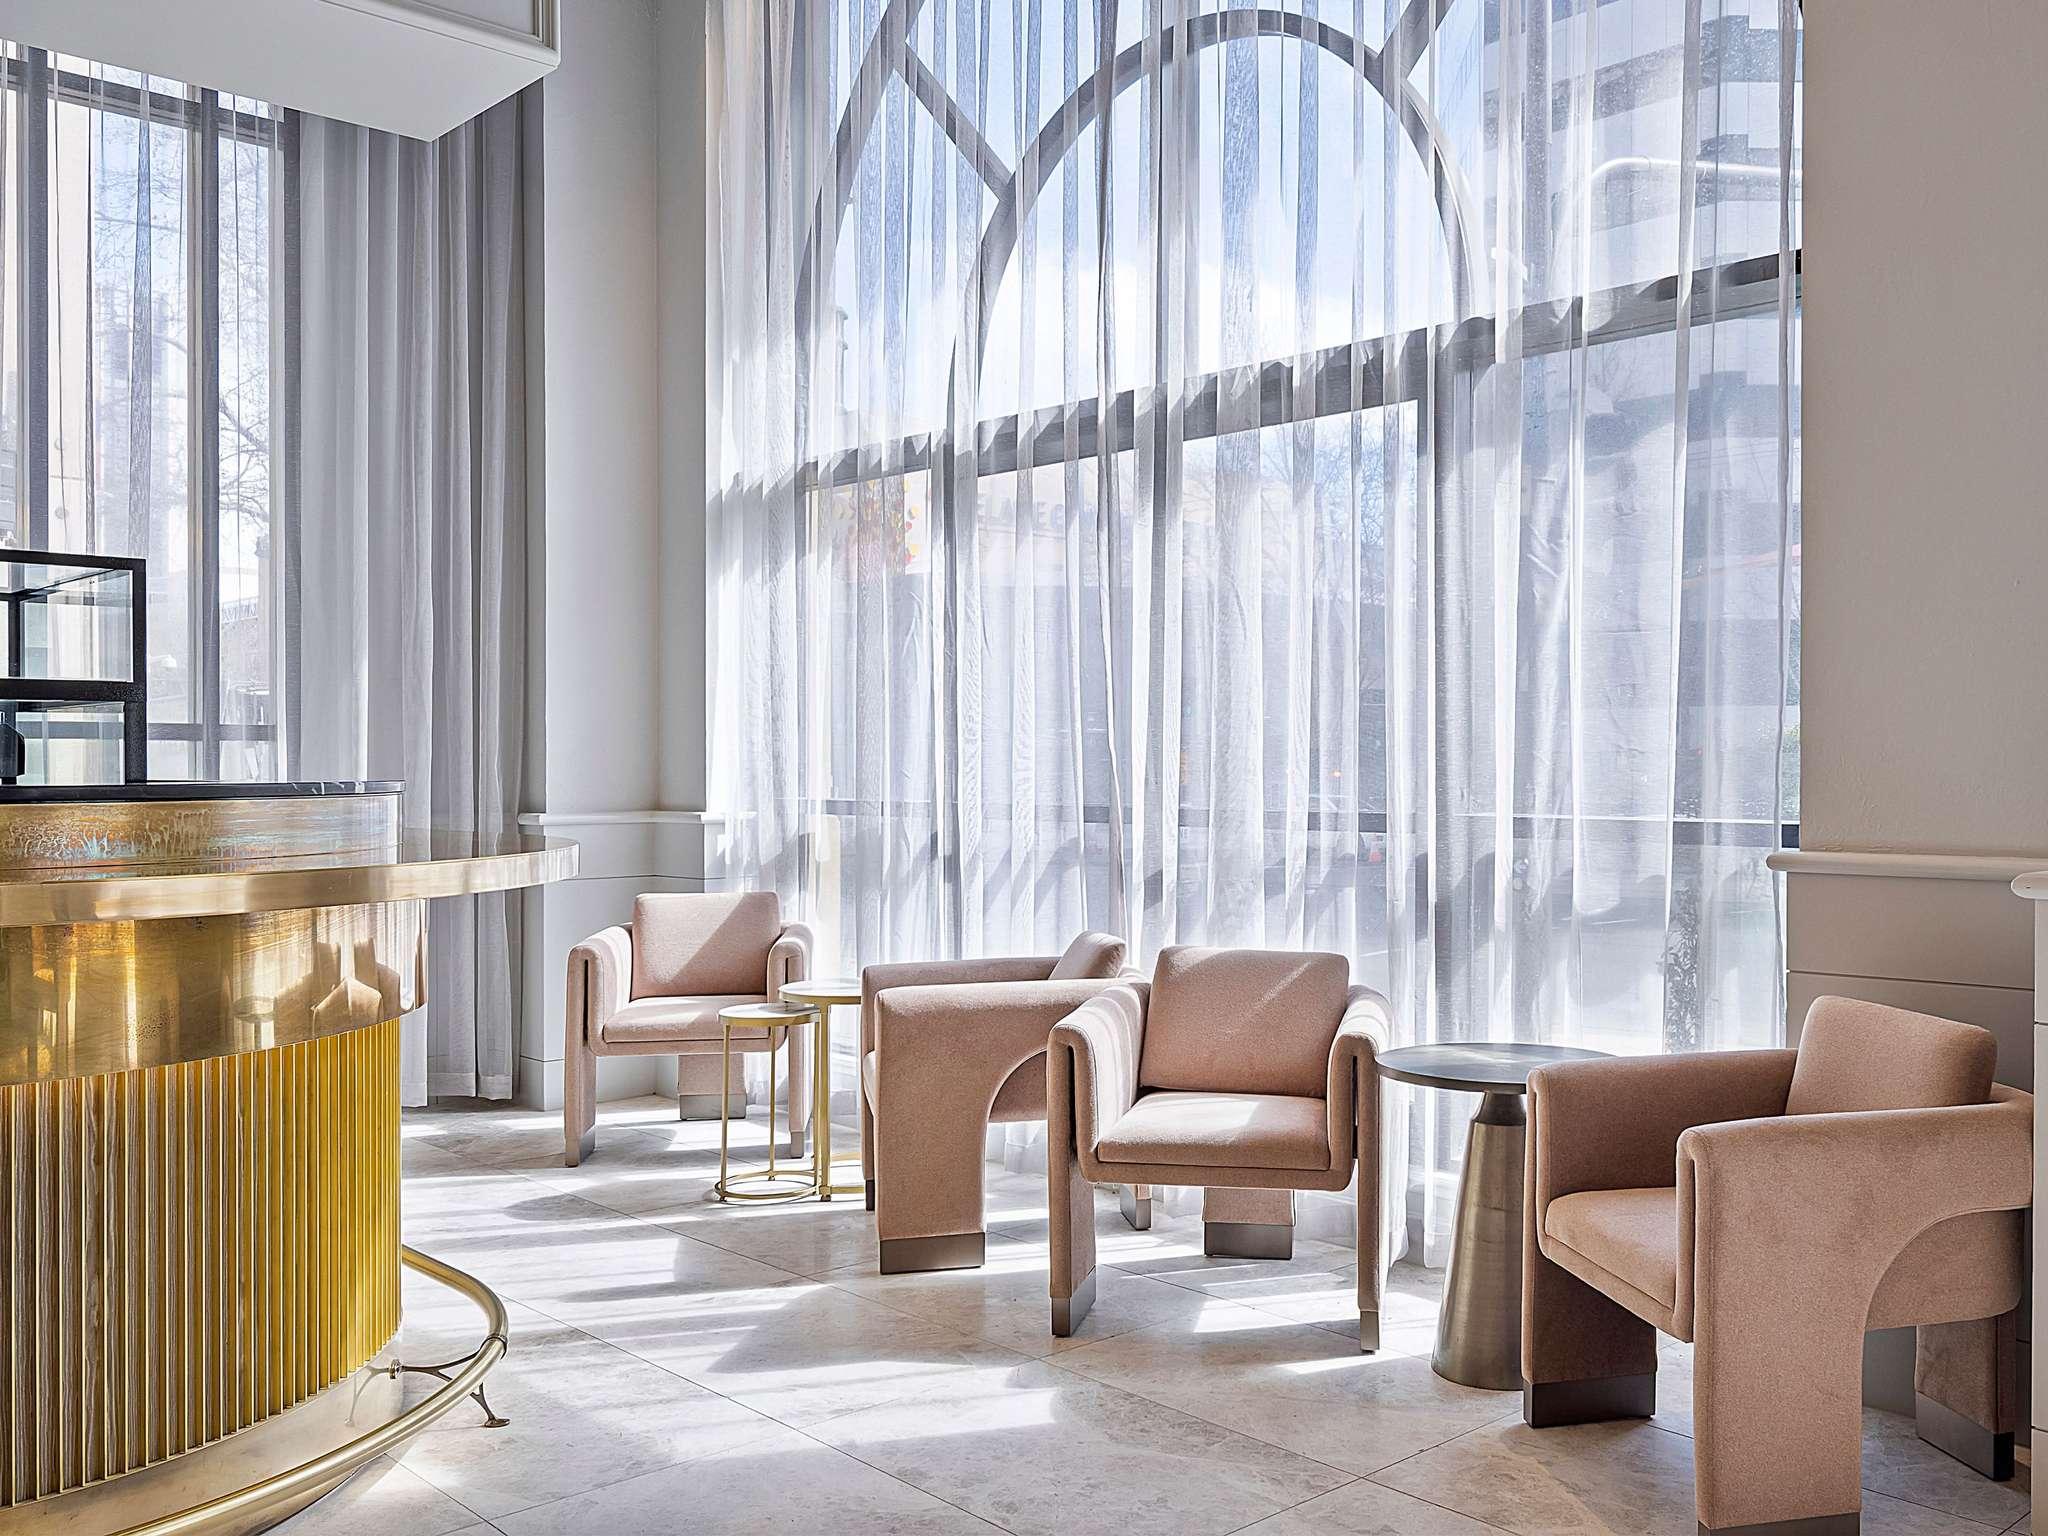 Отель — Отель Плэйфорд Аделаида MGallery by Sofitel